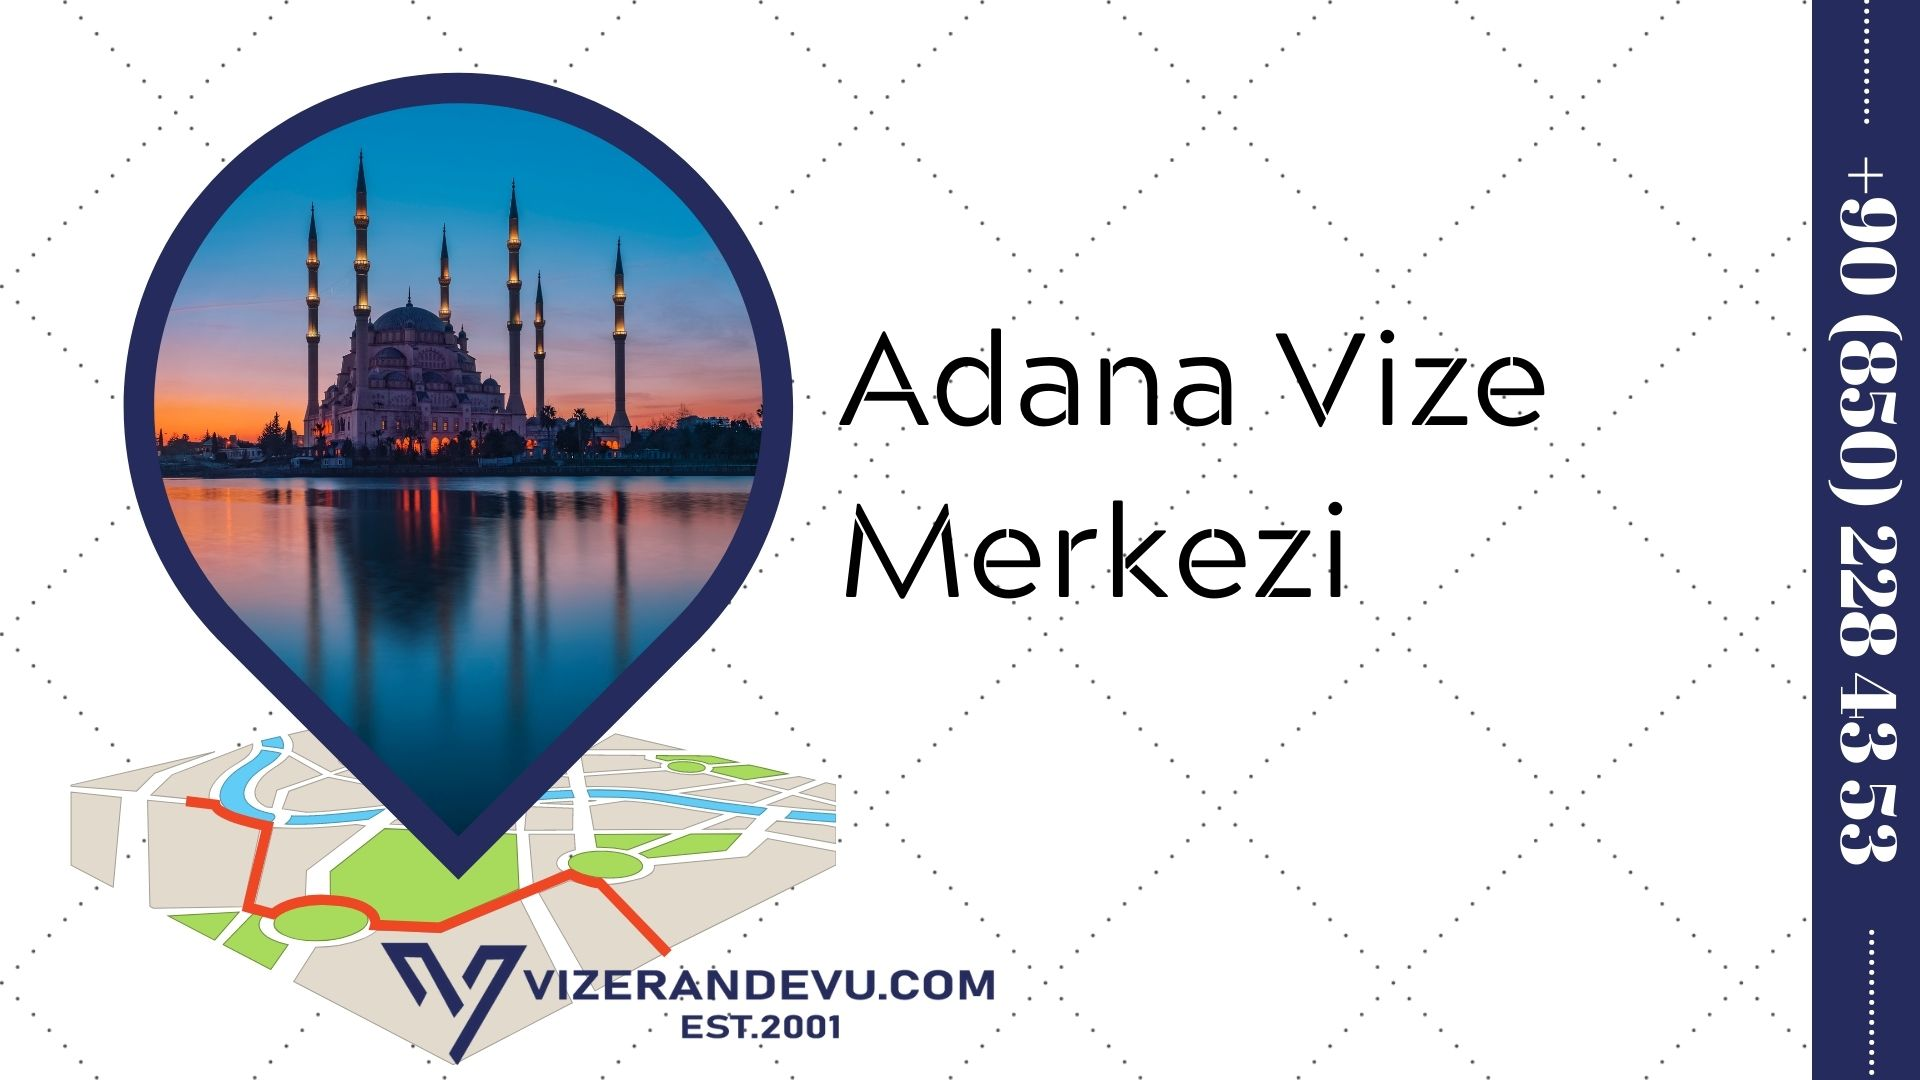 Adana Vize Merkezi